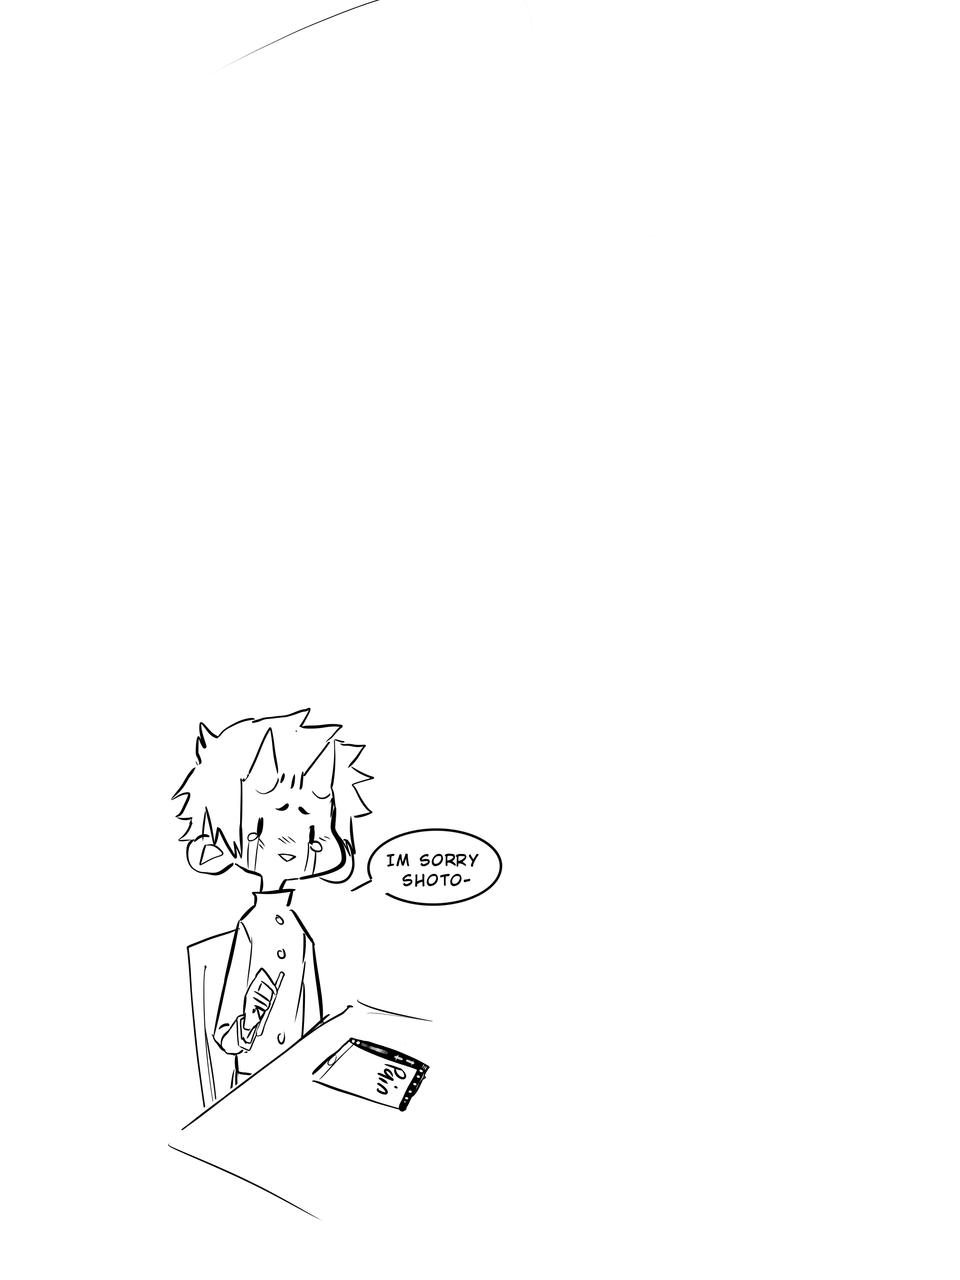 Shoto—- Illust of PogoRabbit ||baku mode|| midevil MyHeroAcademia PAIN! Oof Shoto_Todoroki TeaHea